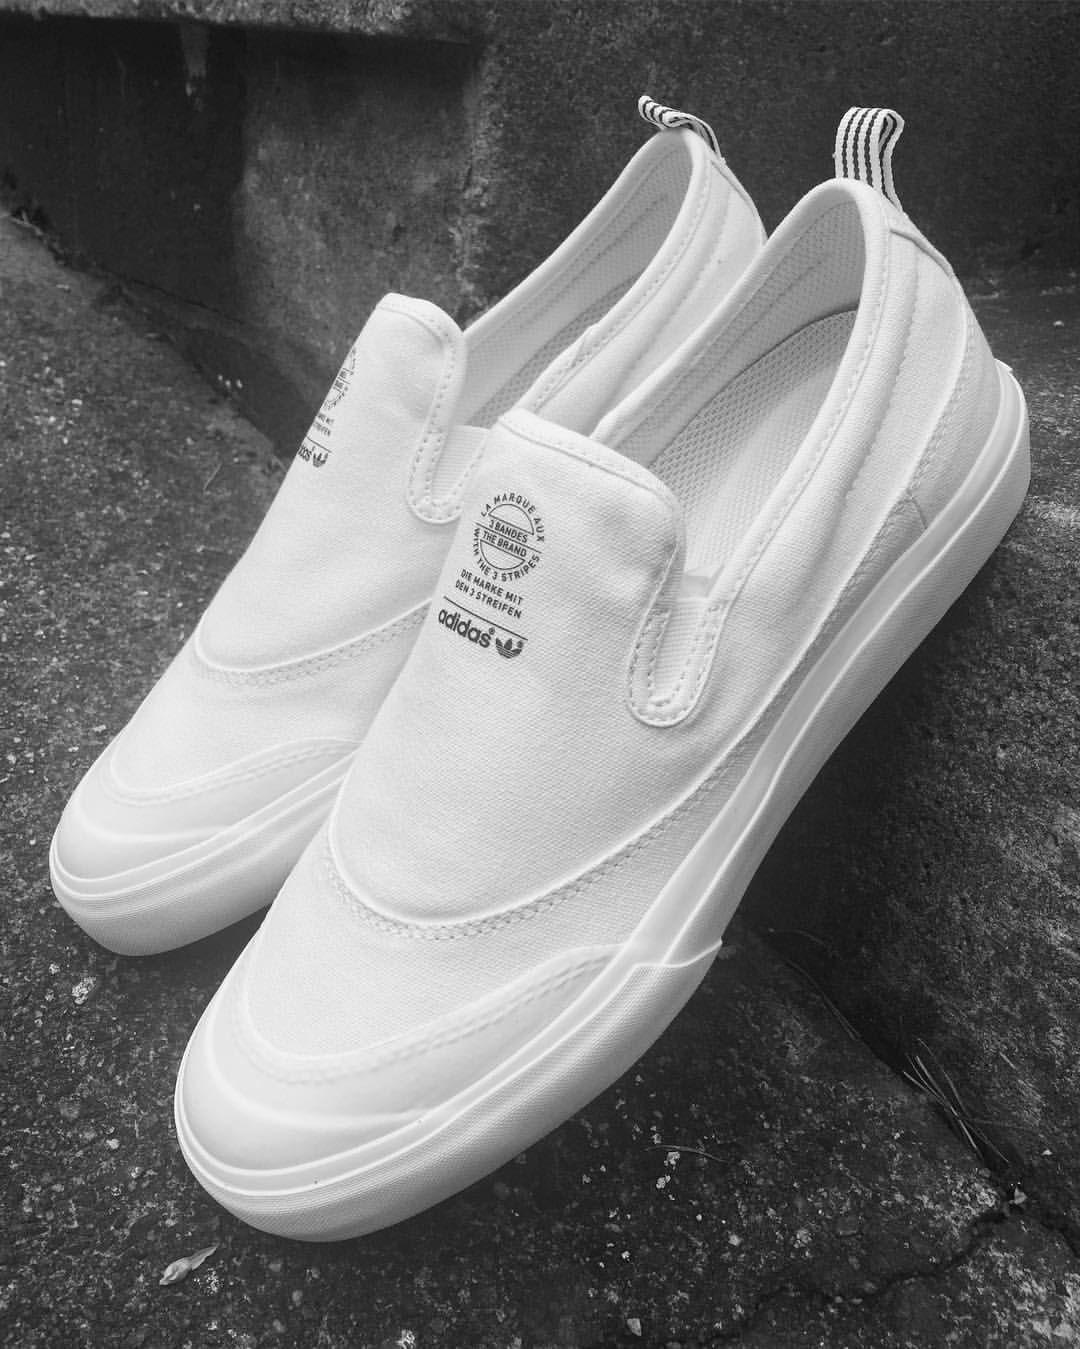 Sneakers men fashion, Mens casual shoes